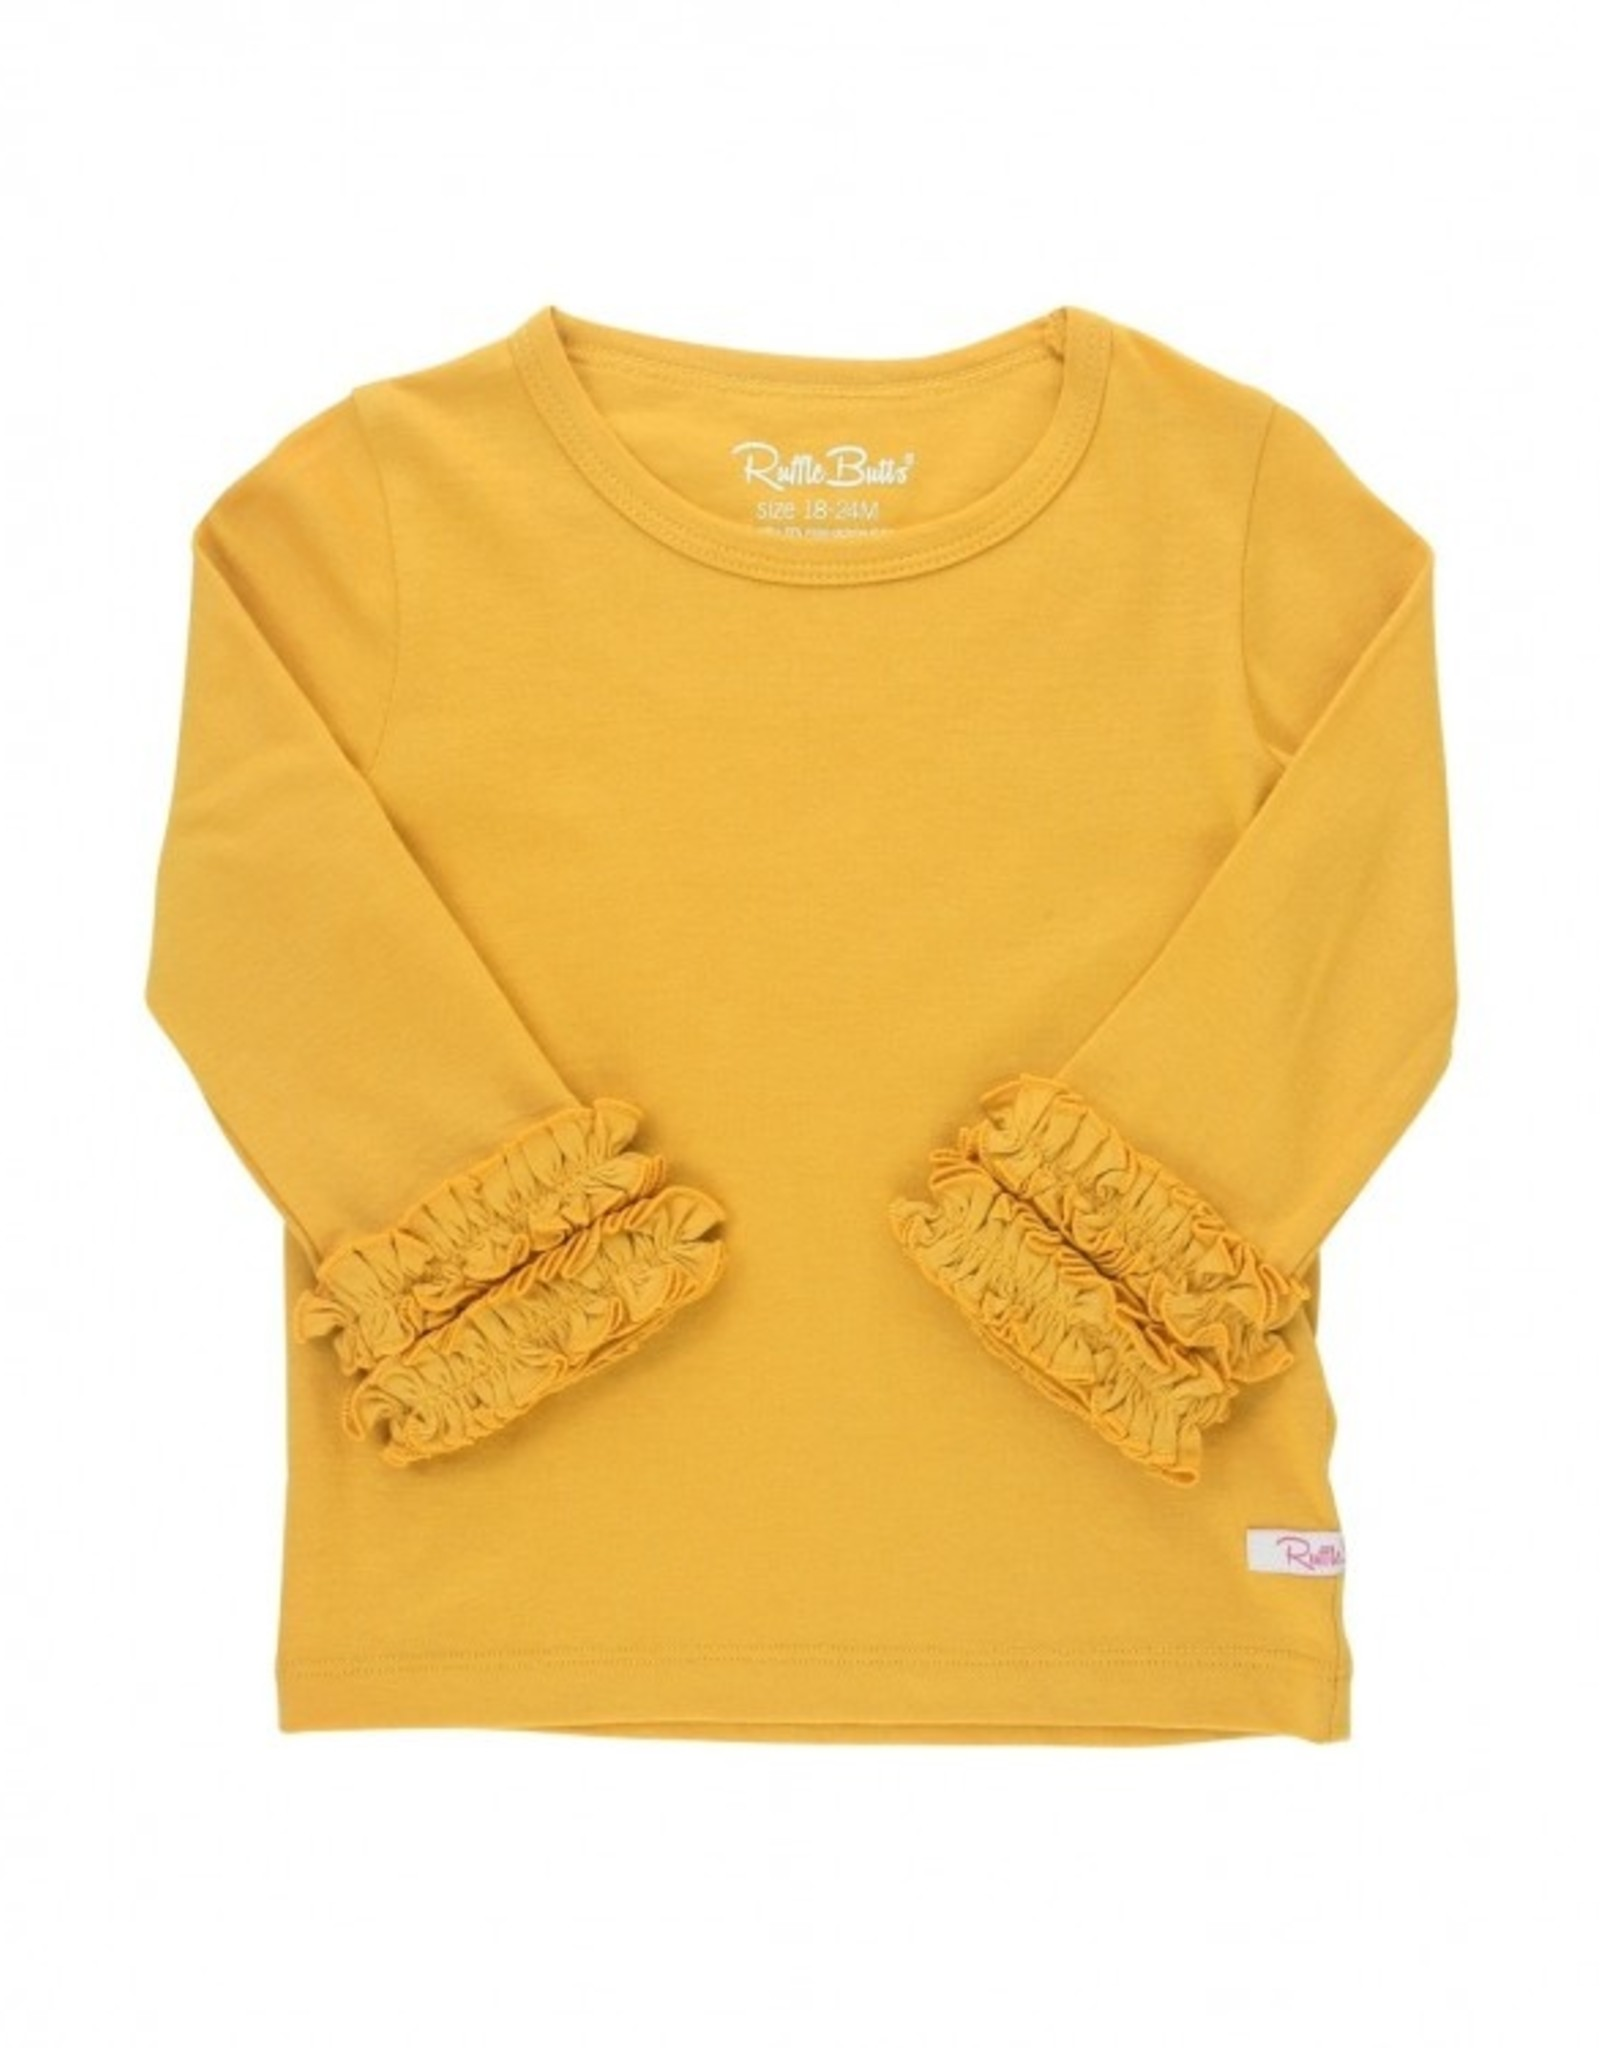 RuffleButts Golden Yellow Ruffles lg Sleeve Layering Tee